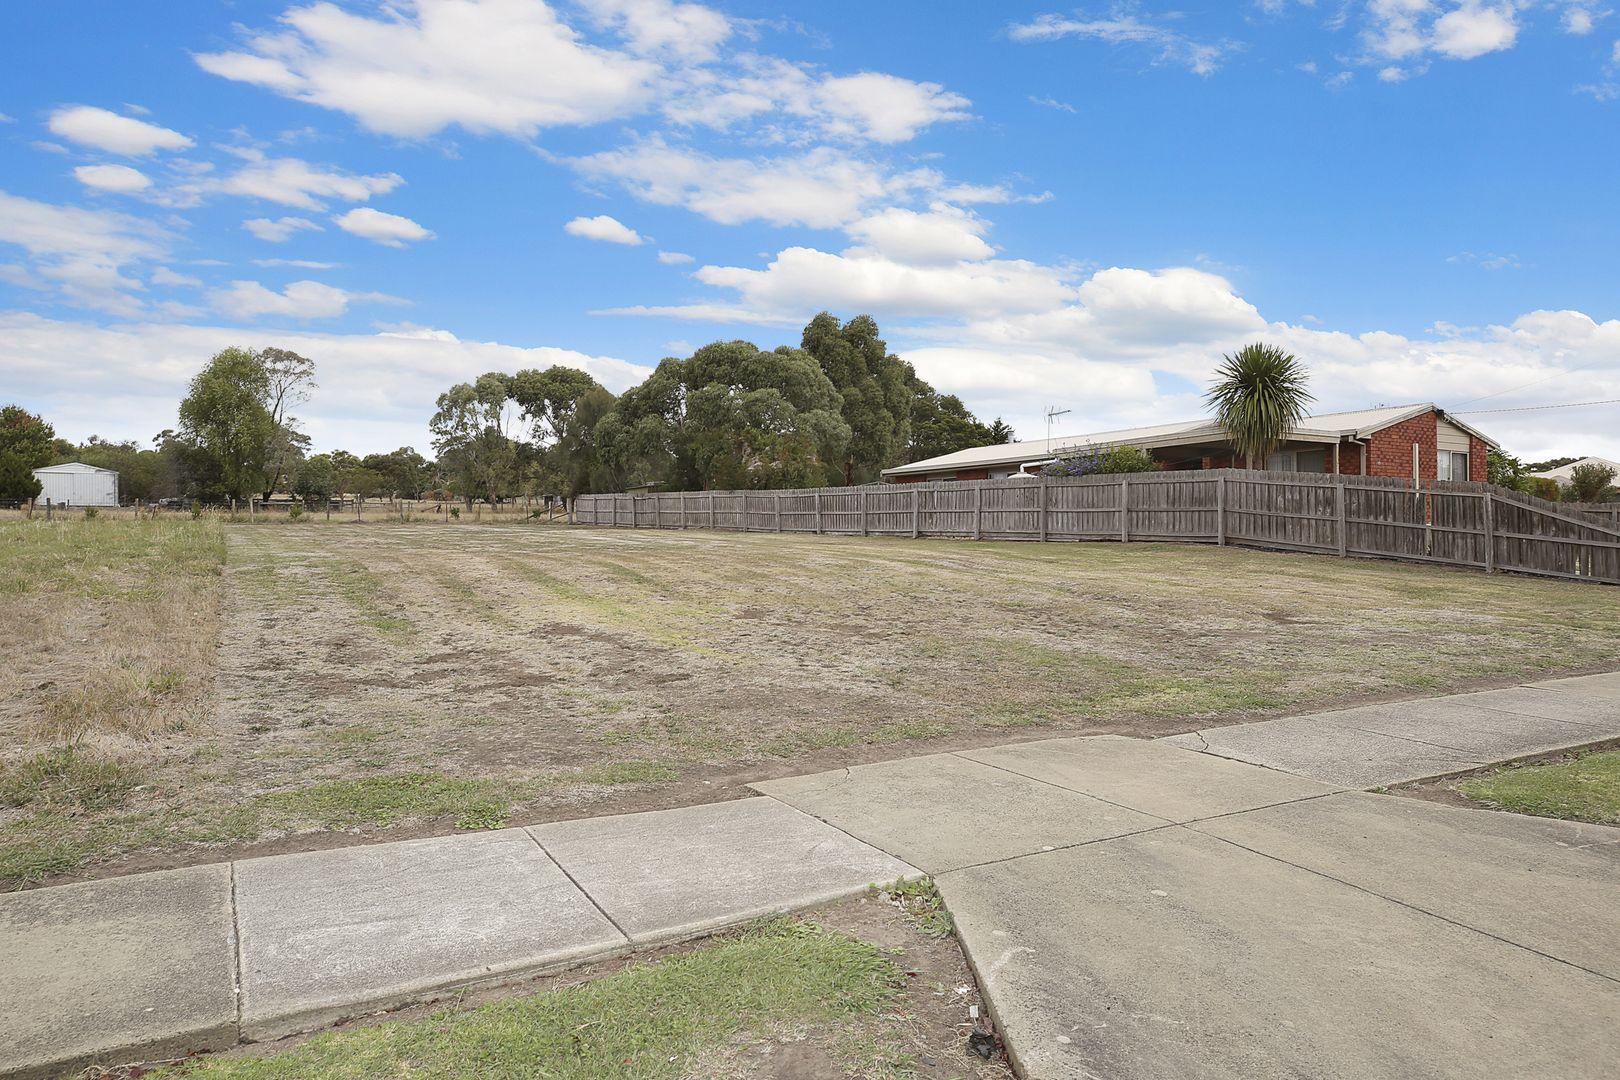 13 Mcalpine Court, Camperdown VIC 3260, Image 0